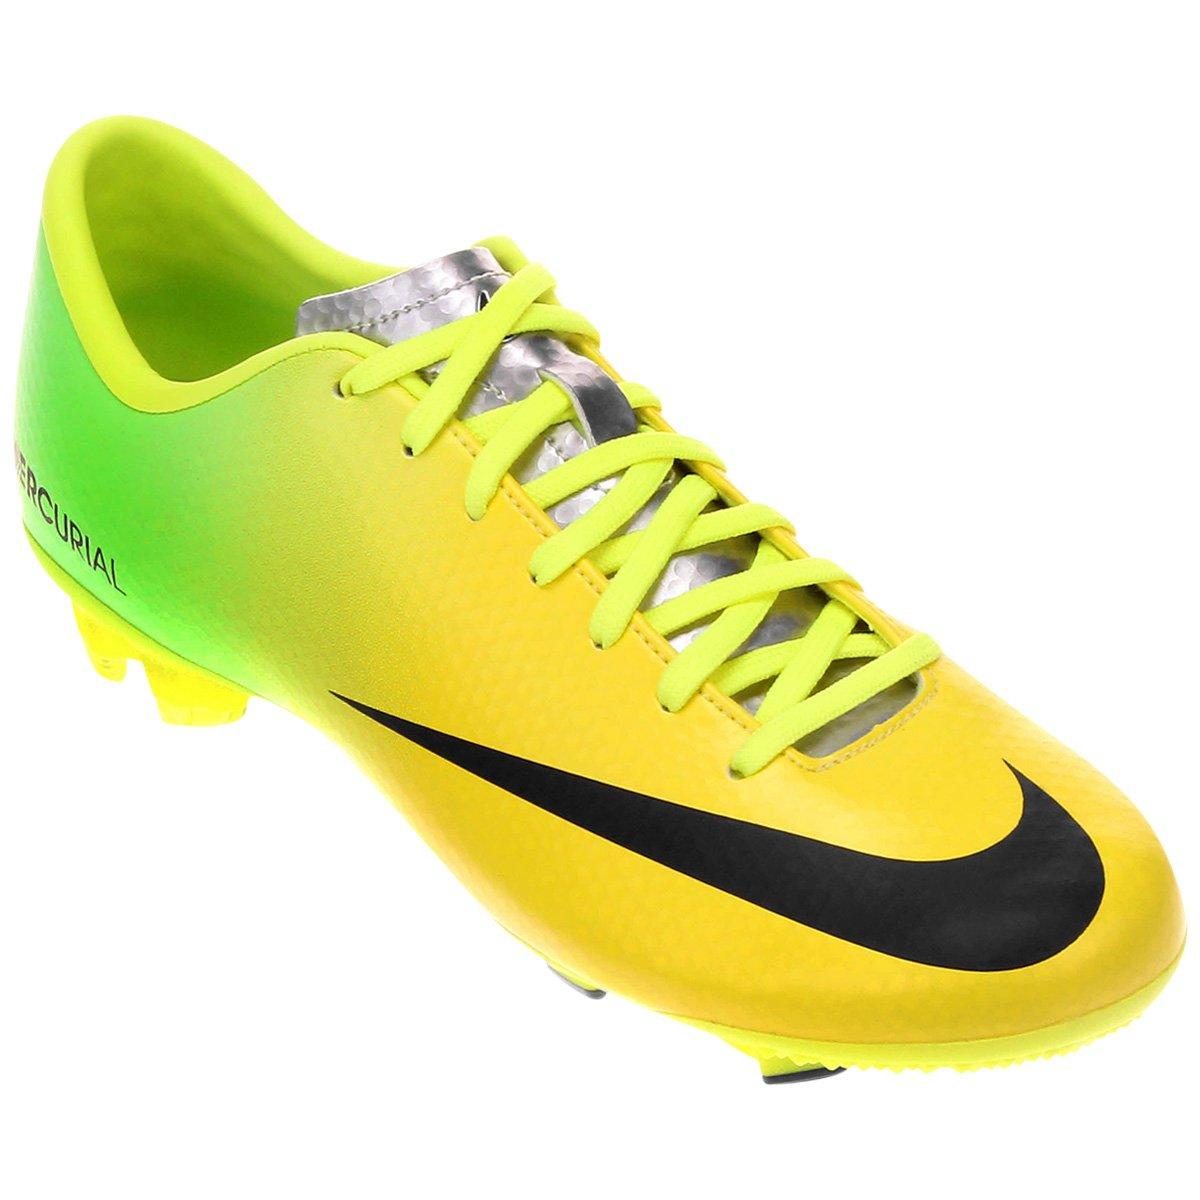 9c537a93c5 Chuteira Nike Mercurial Victory IV FG